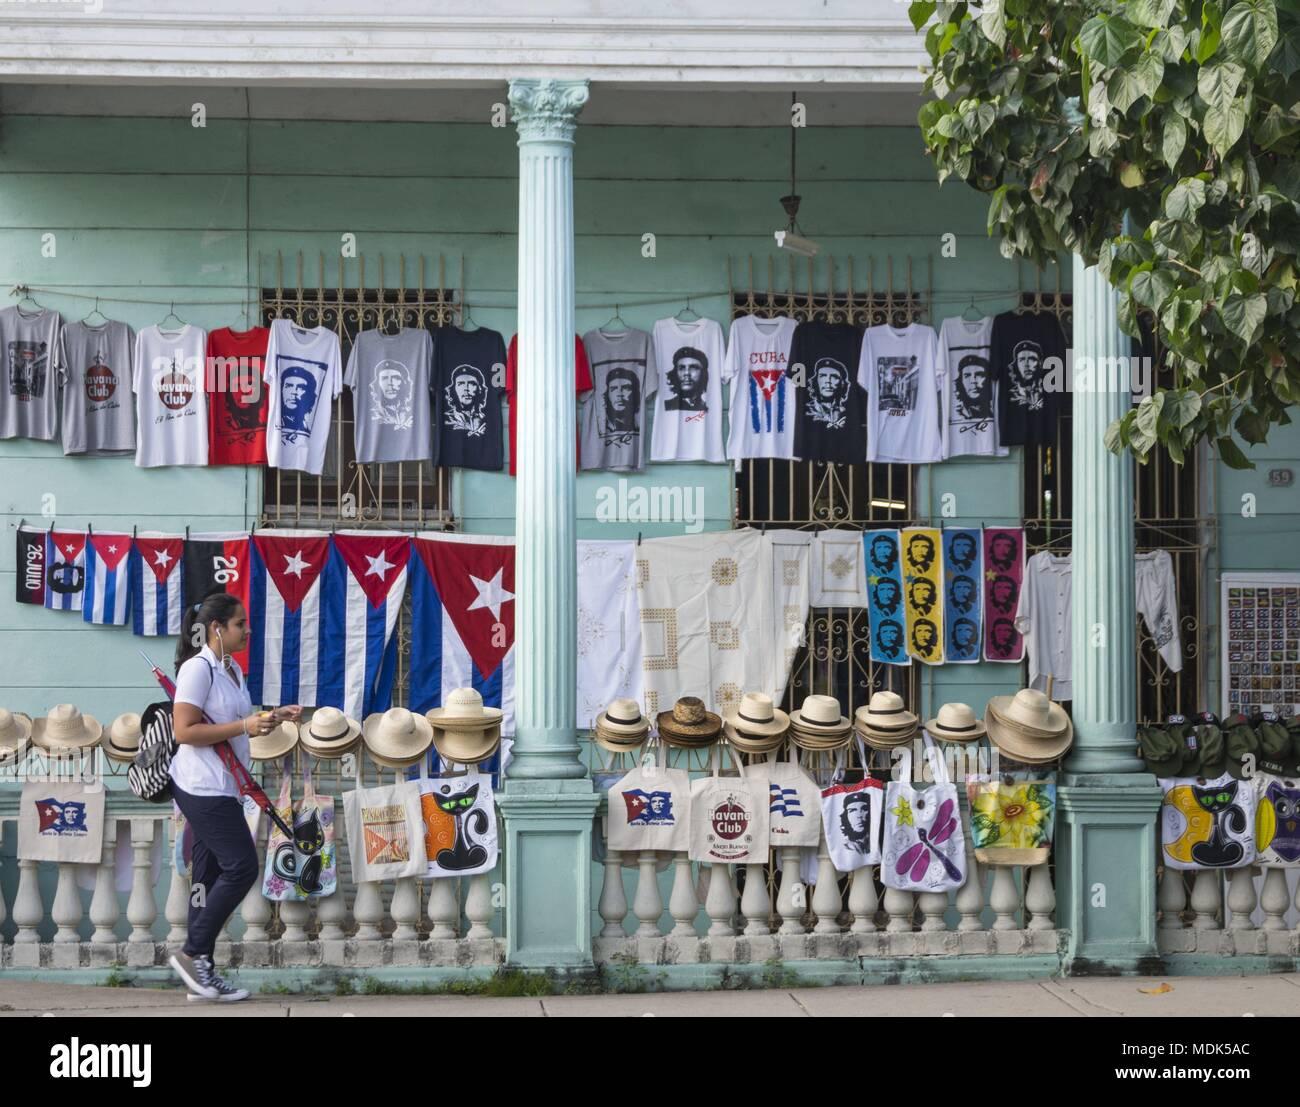 Santa Clara, Cuba. 28th Nov, 2017. Che Guevara is highly revered as a revolutionary leader throughout Cuba. (28 November 2017) | usage worldwide Credit: dpa/Alamy Live News - Stock Image